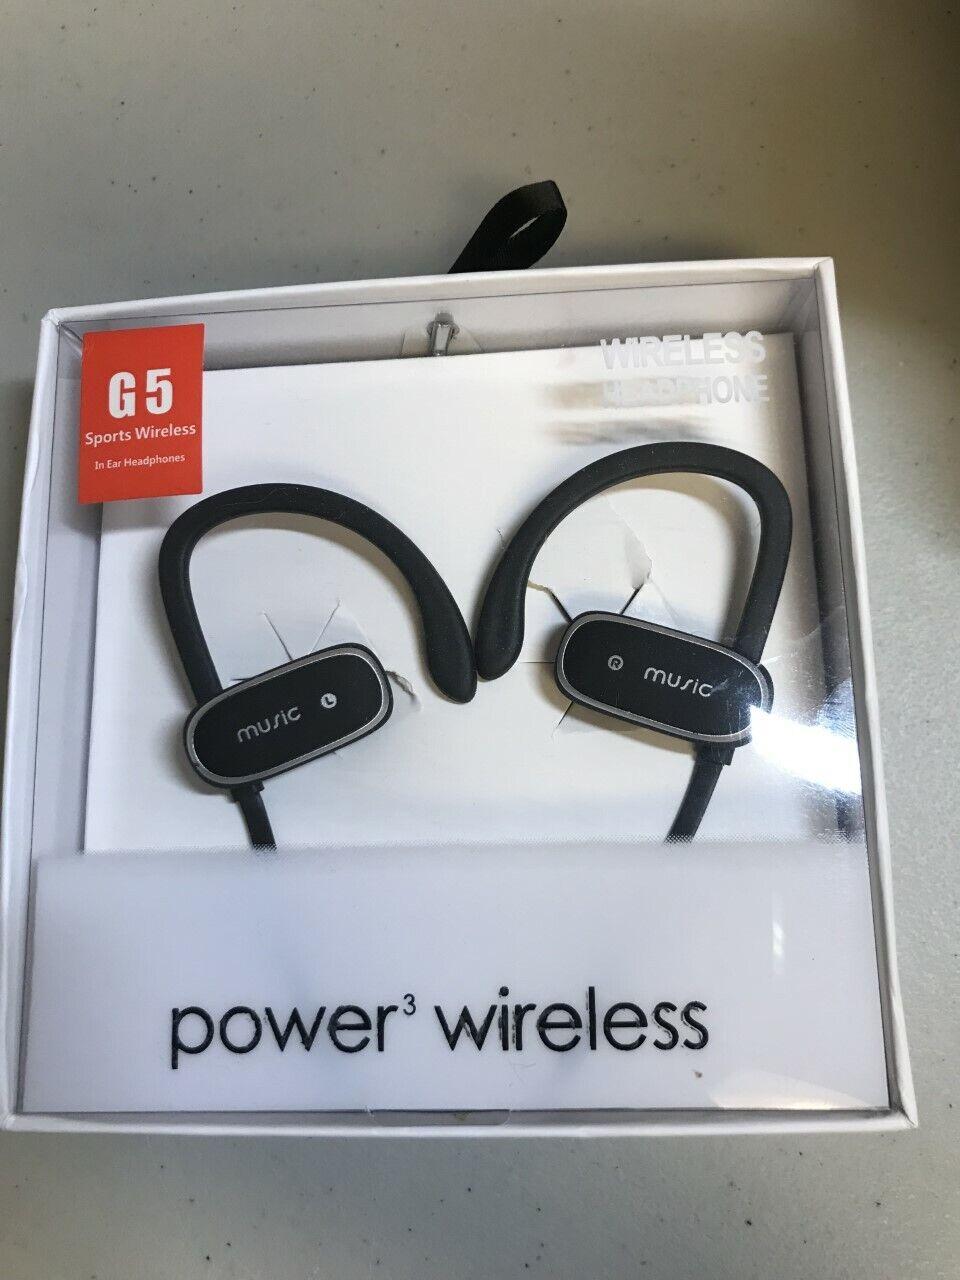 Power3 Wireless Sports Bluetooth In-ear Headphones Stereo Headset Red